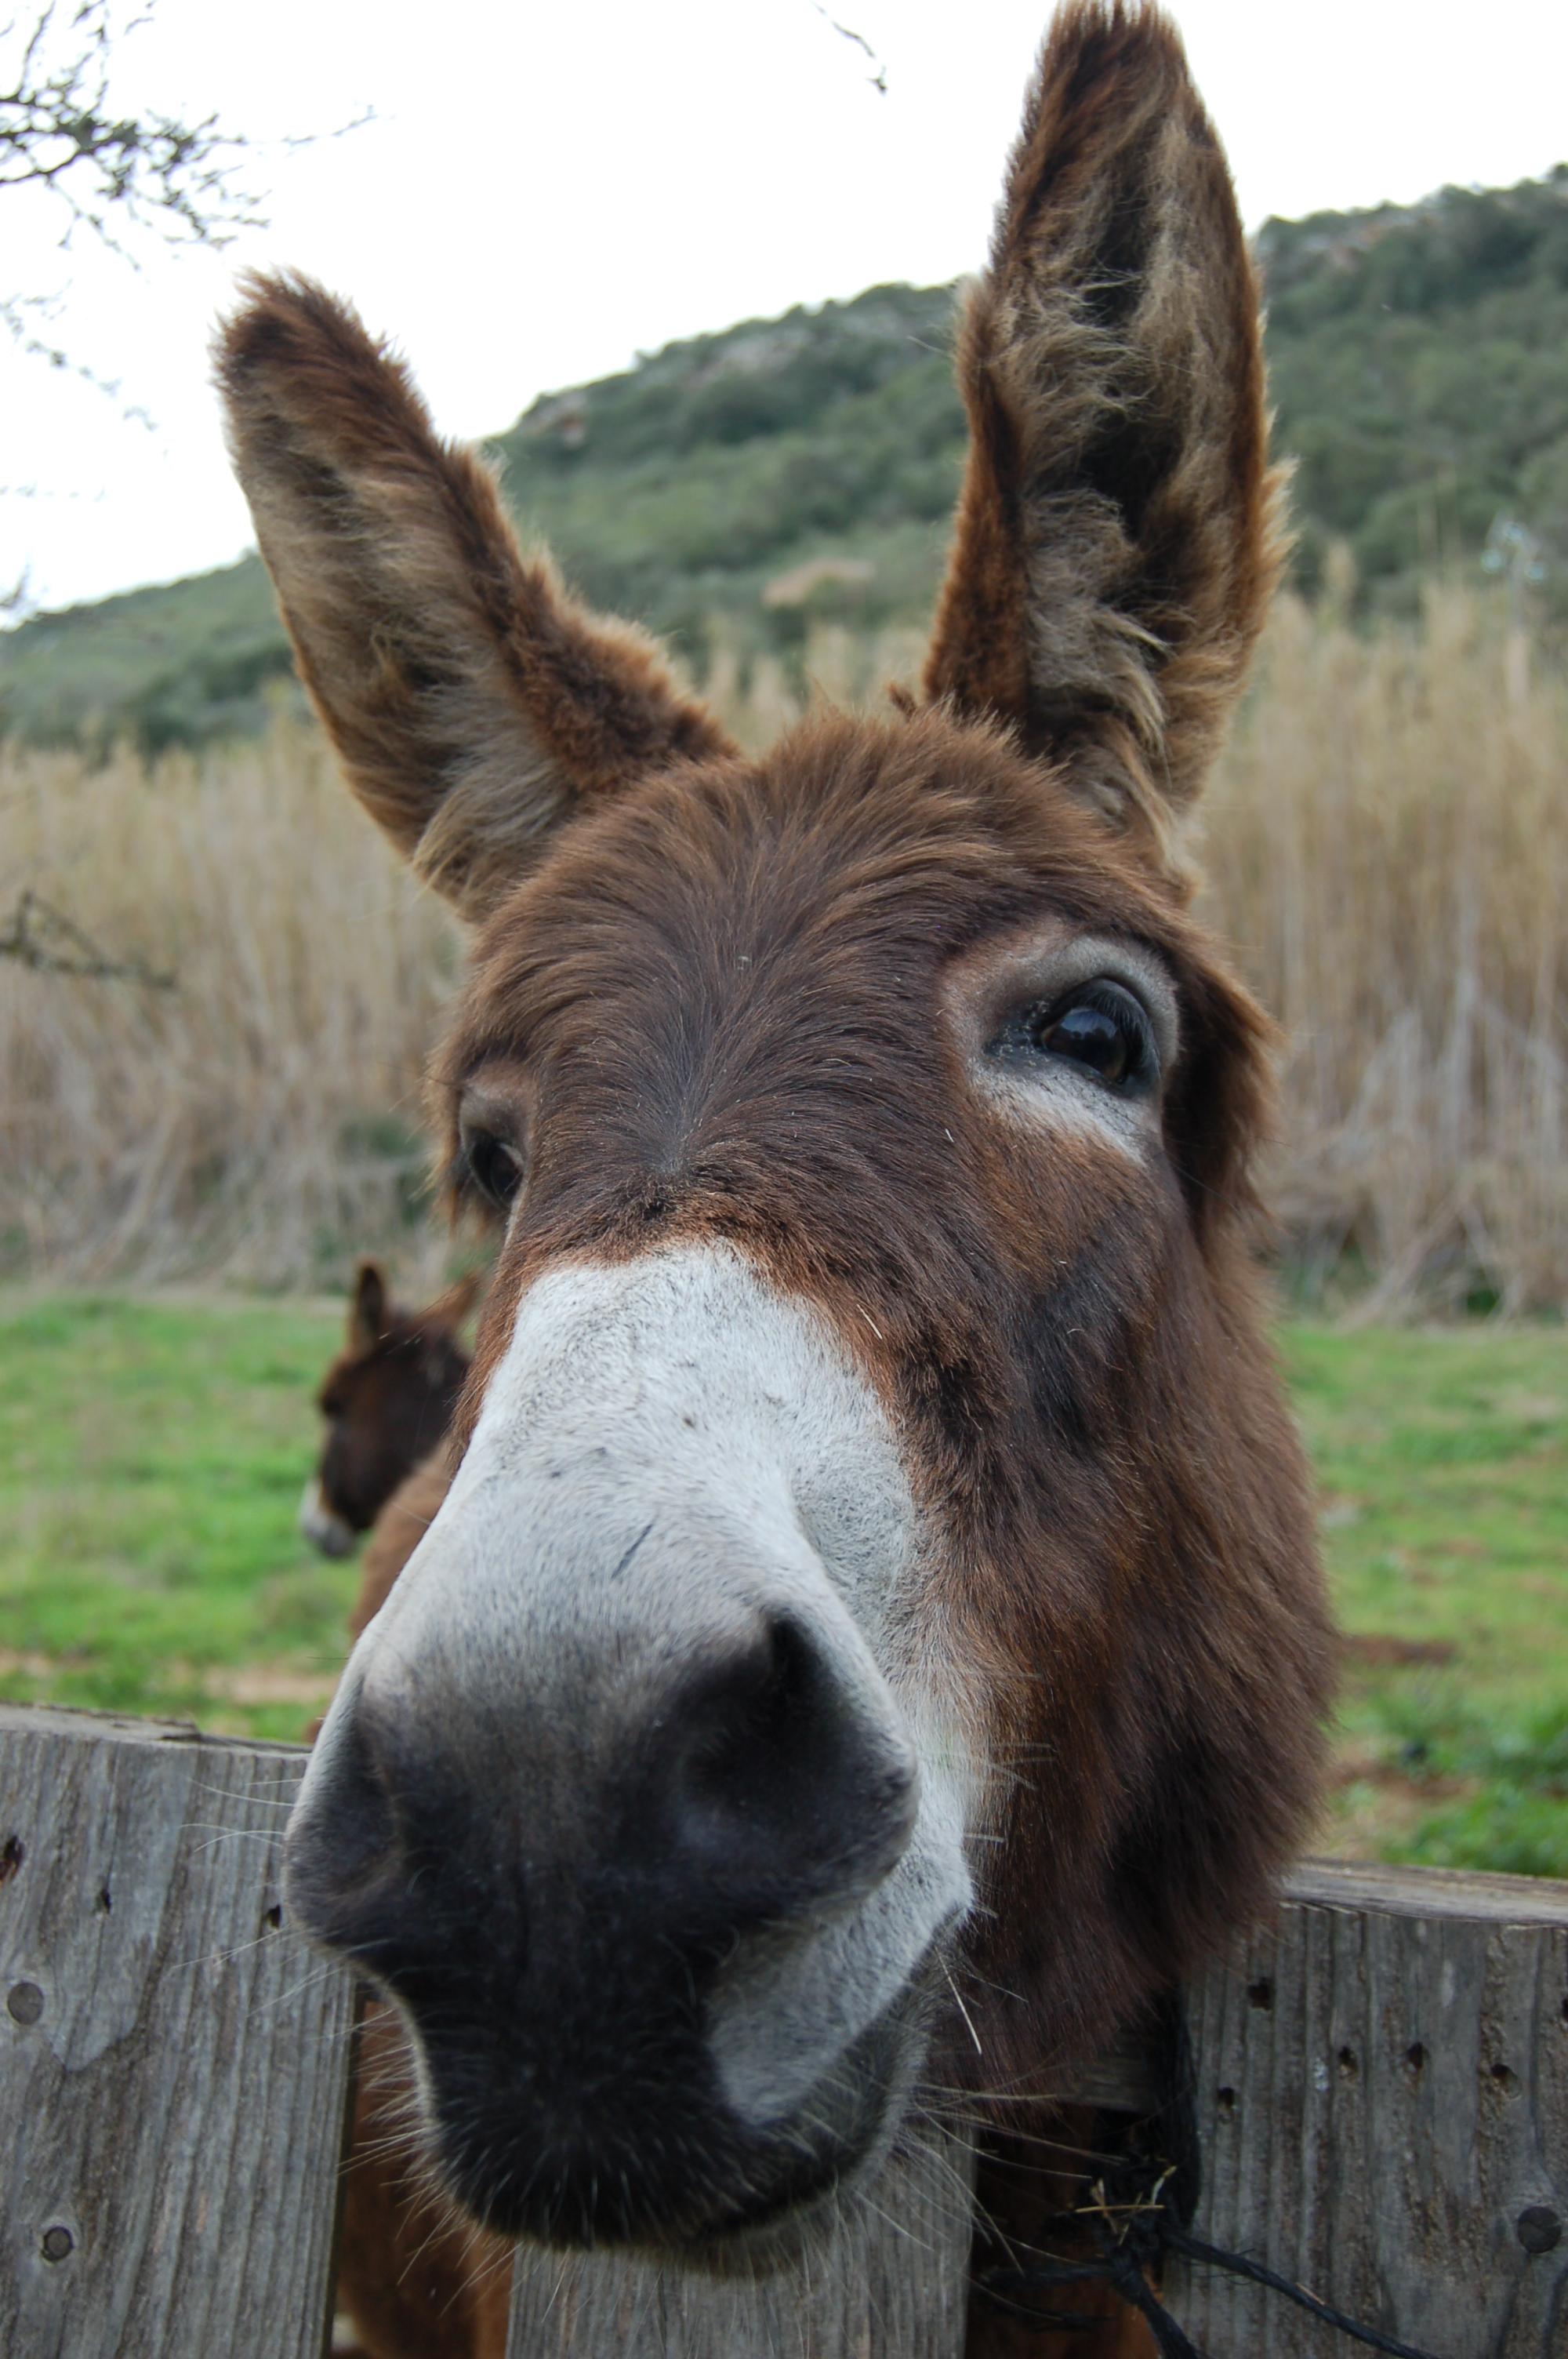 Donkey at a gate